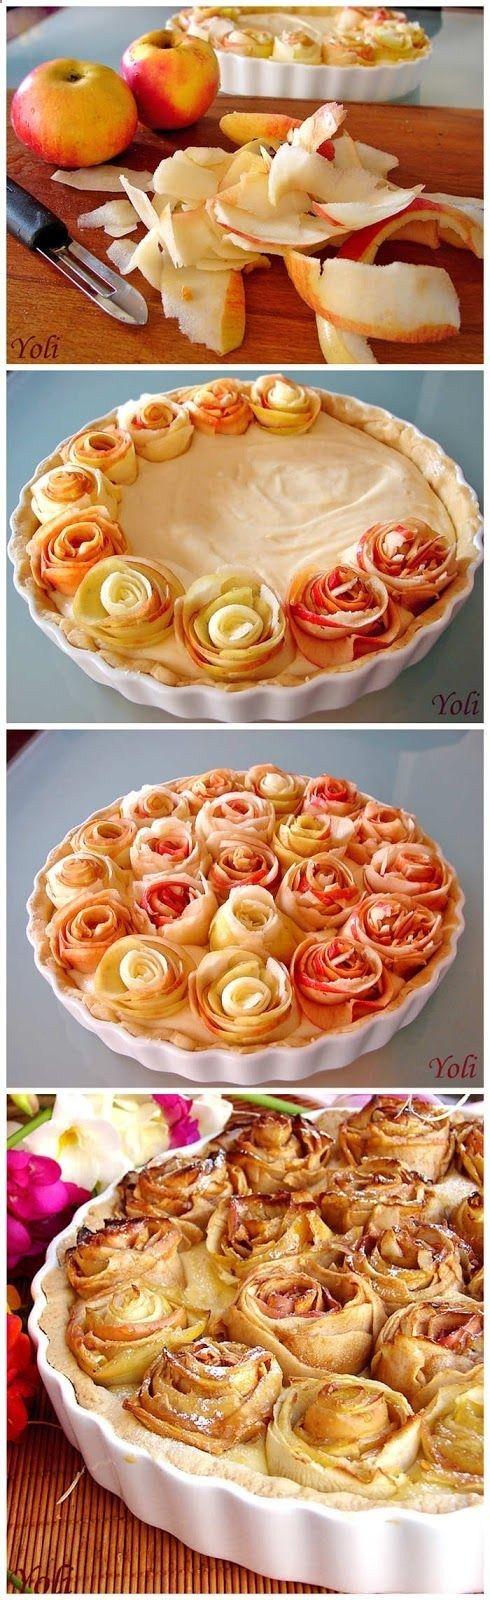 tarata de rosas de manzana